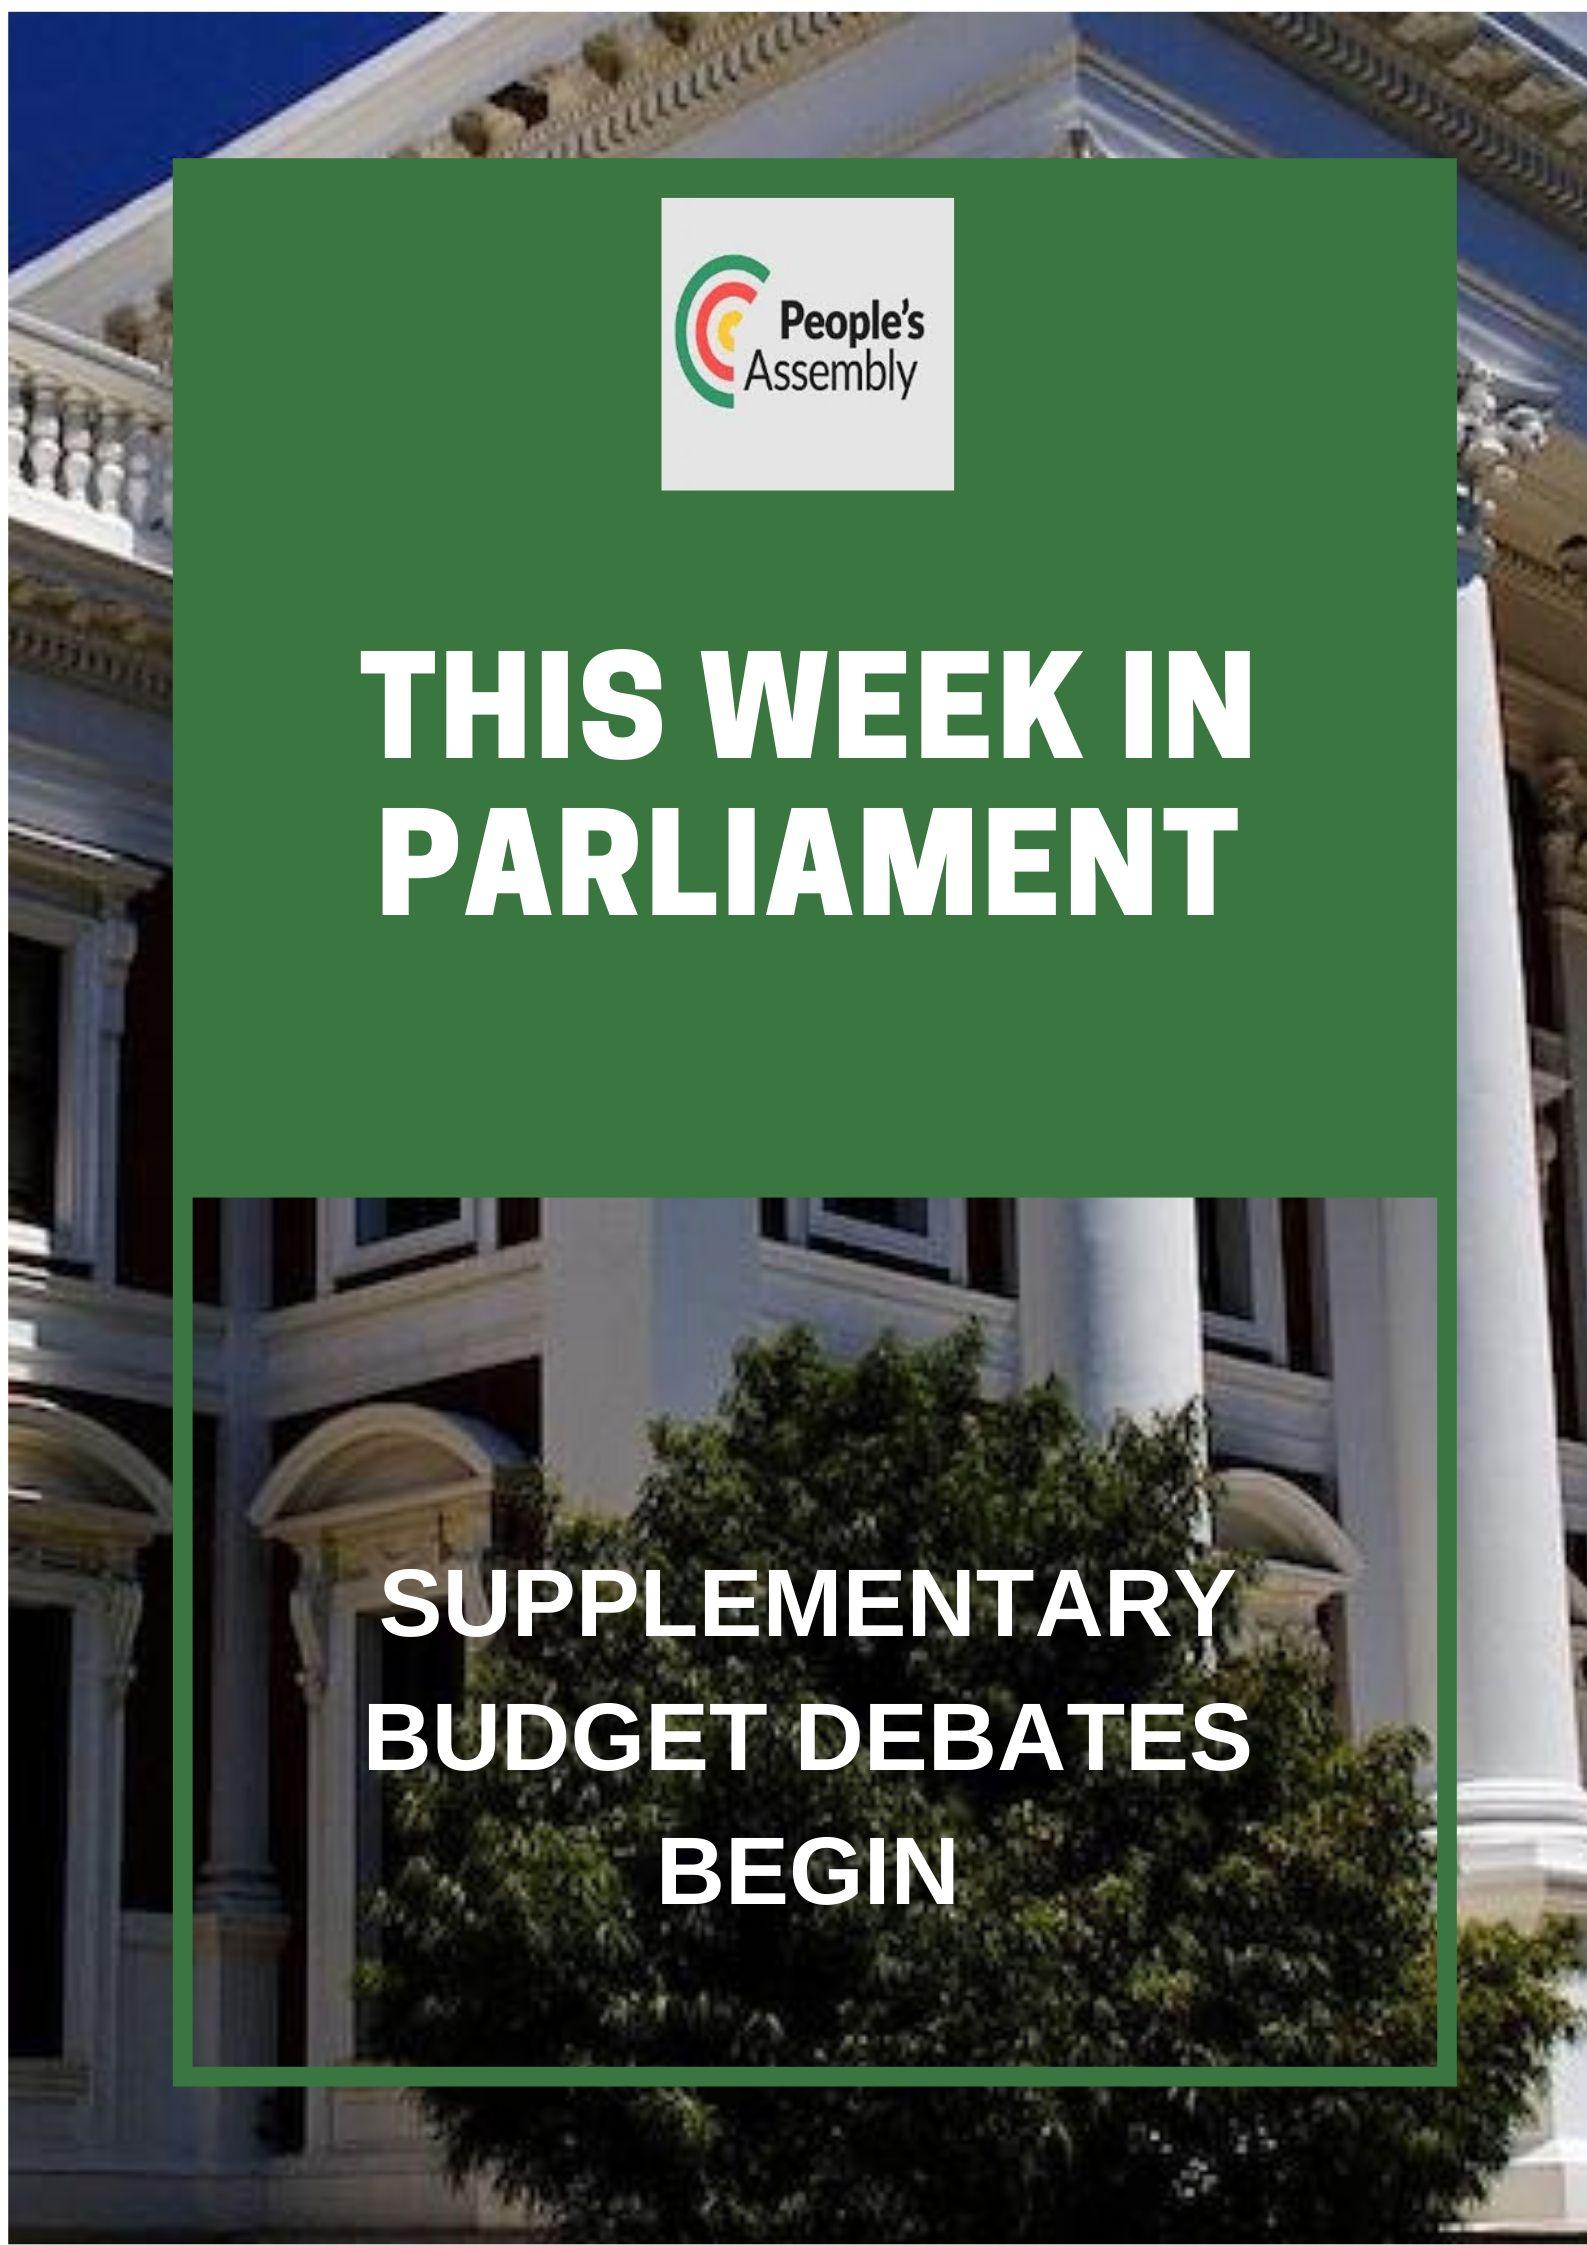 budget debates begin